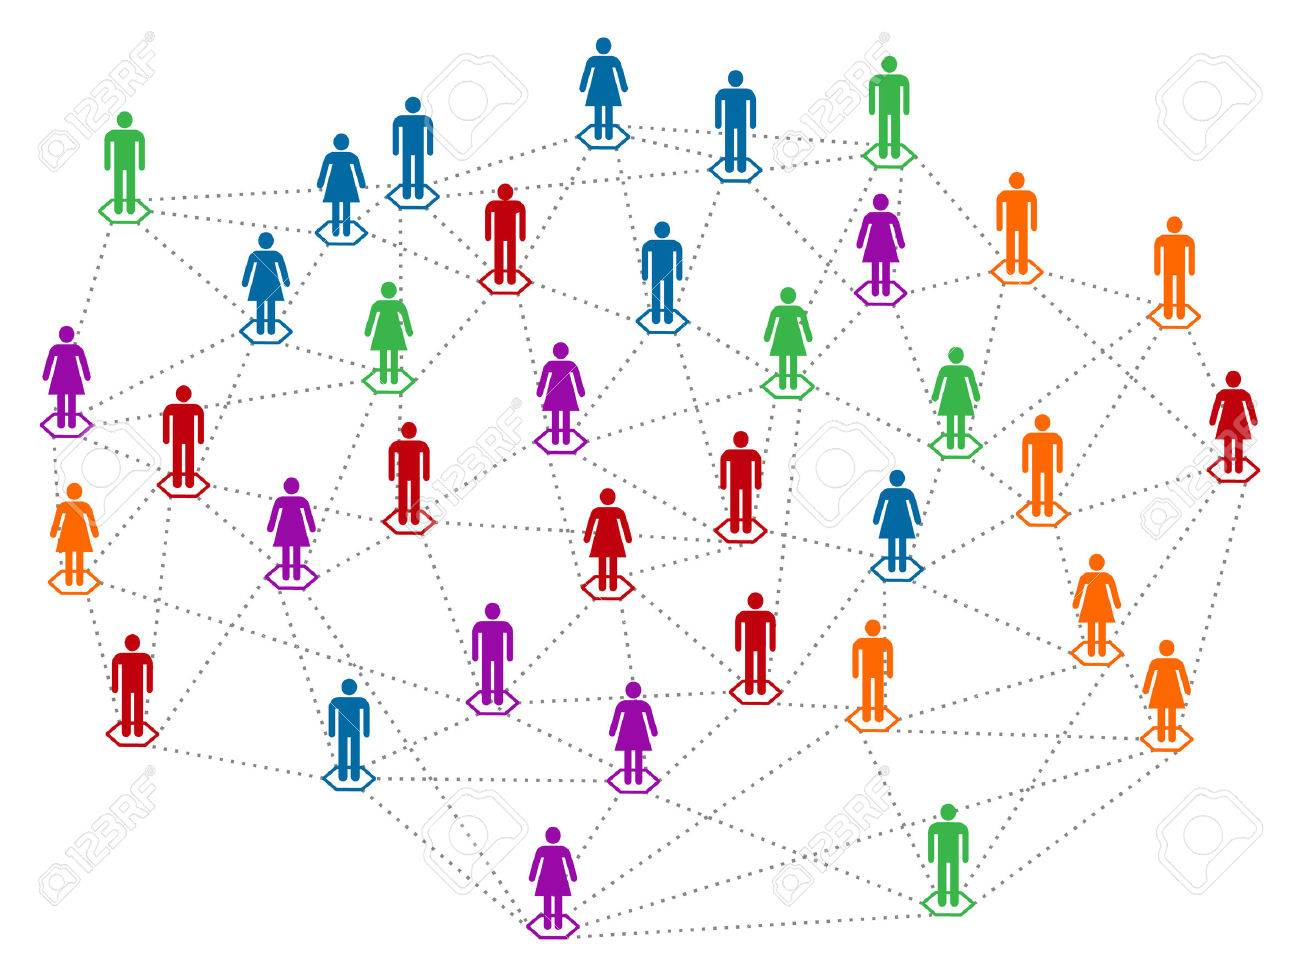 networt コンセプト 別の色のコミュニティ 人口 男性と女性が一緒に